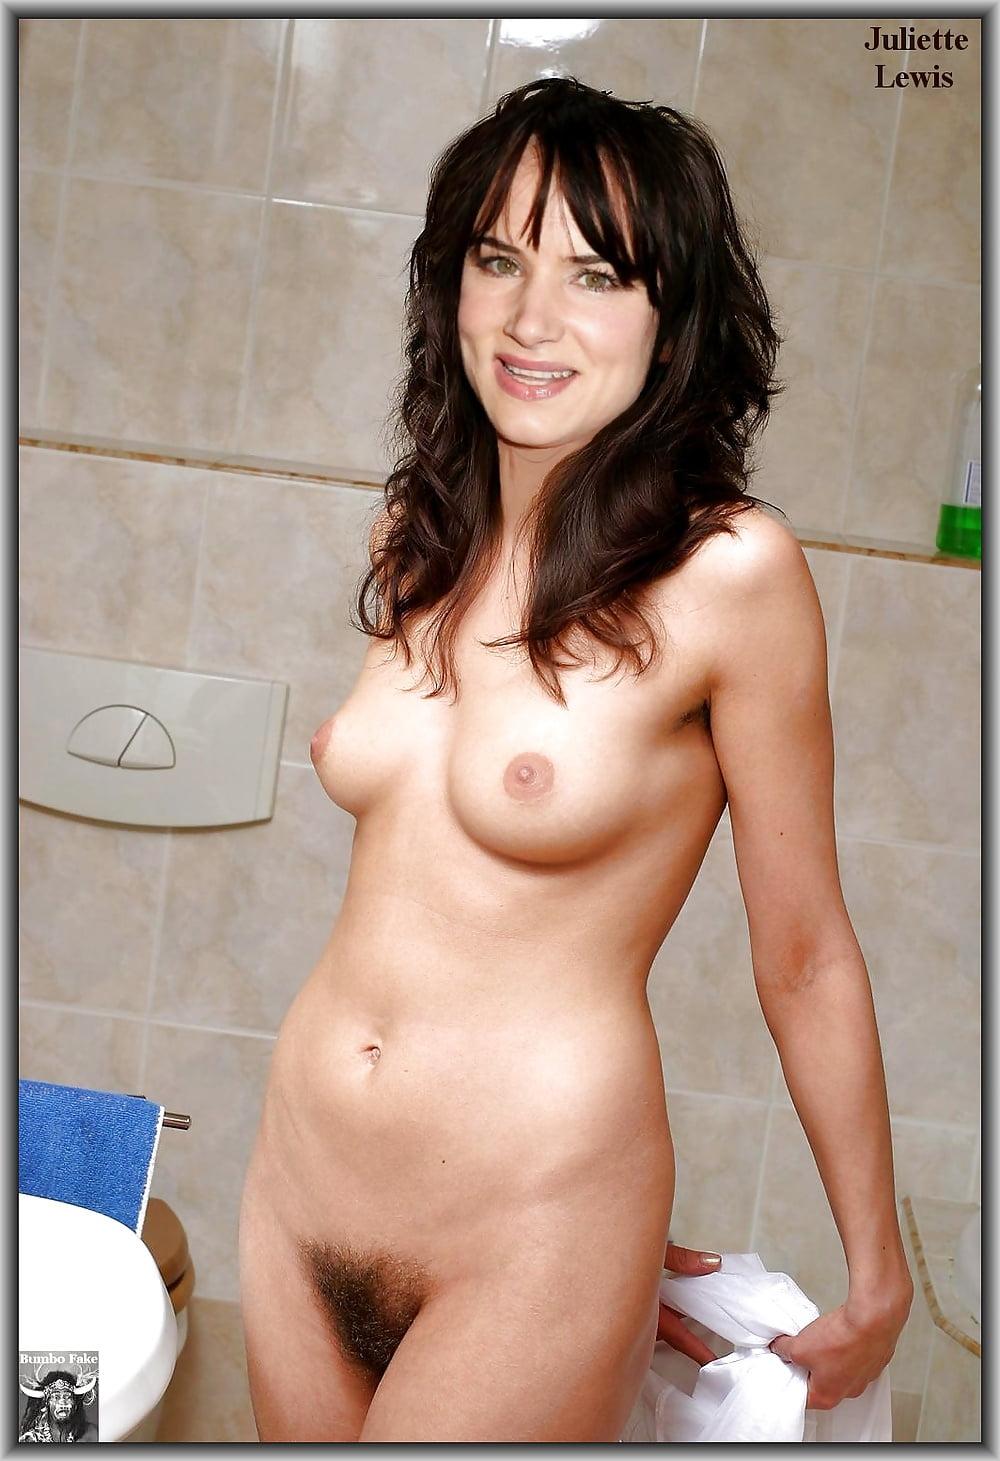 Juliette lewis naked fakes